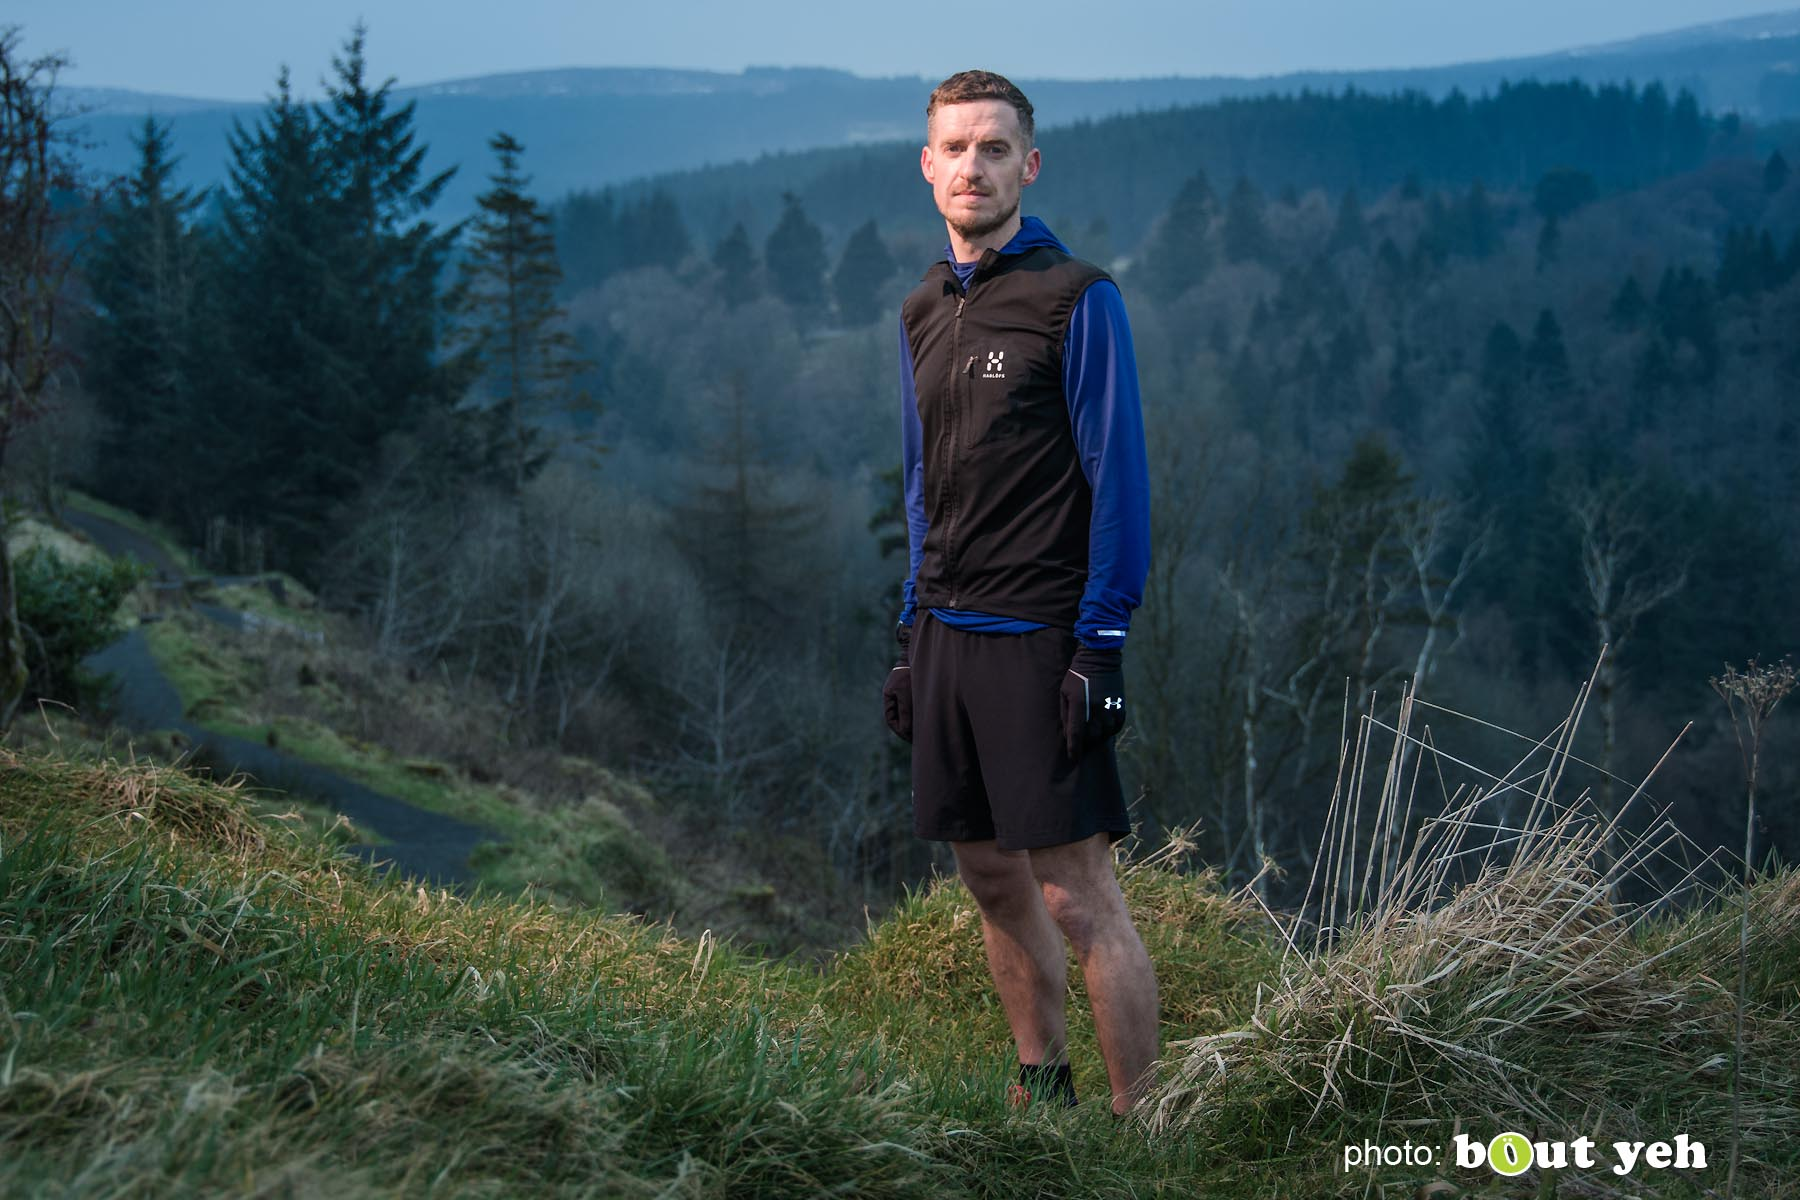 Tim, of Ballymena Runners, at Glenariff Forest, Northern Ireland - photo 0611.